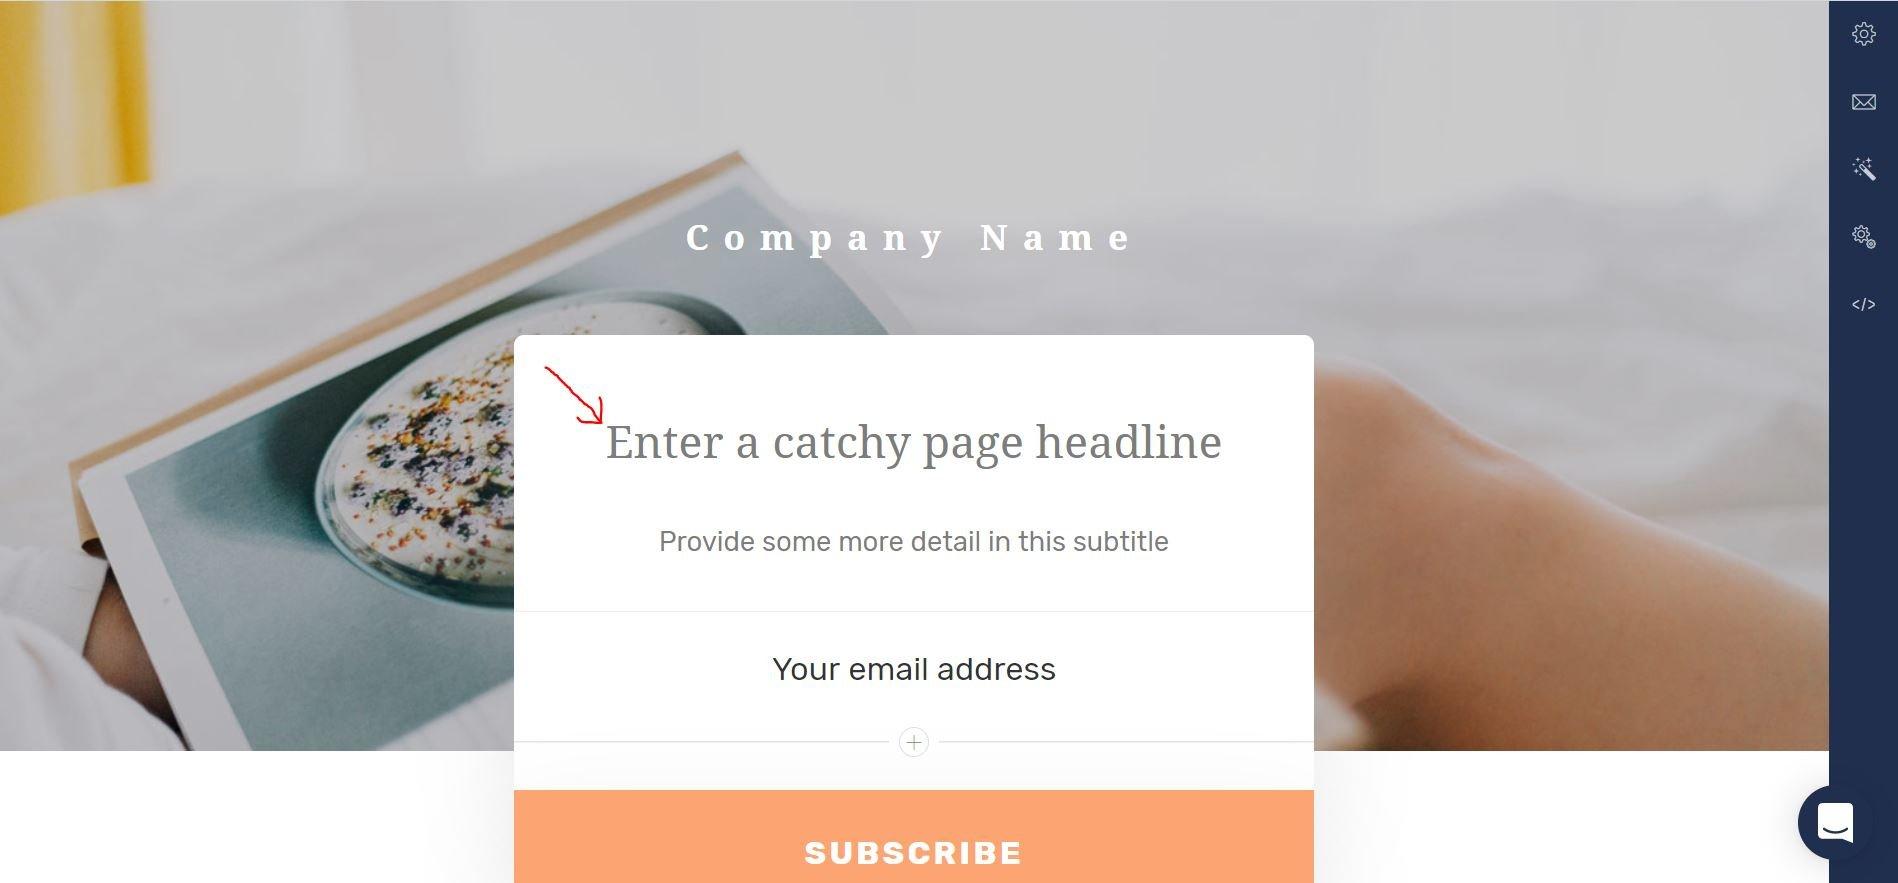 Kristen Leigh | WordPress Web Design Studio | ConvertKit Landing Page Step 4 Edit Branding and Copy